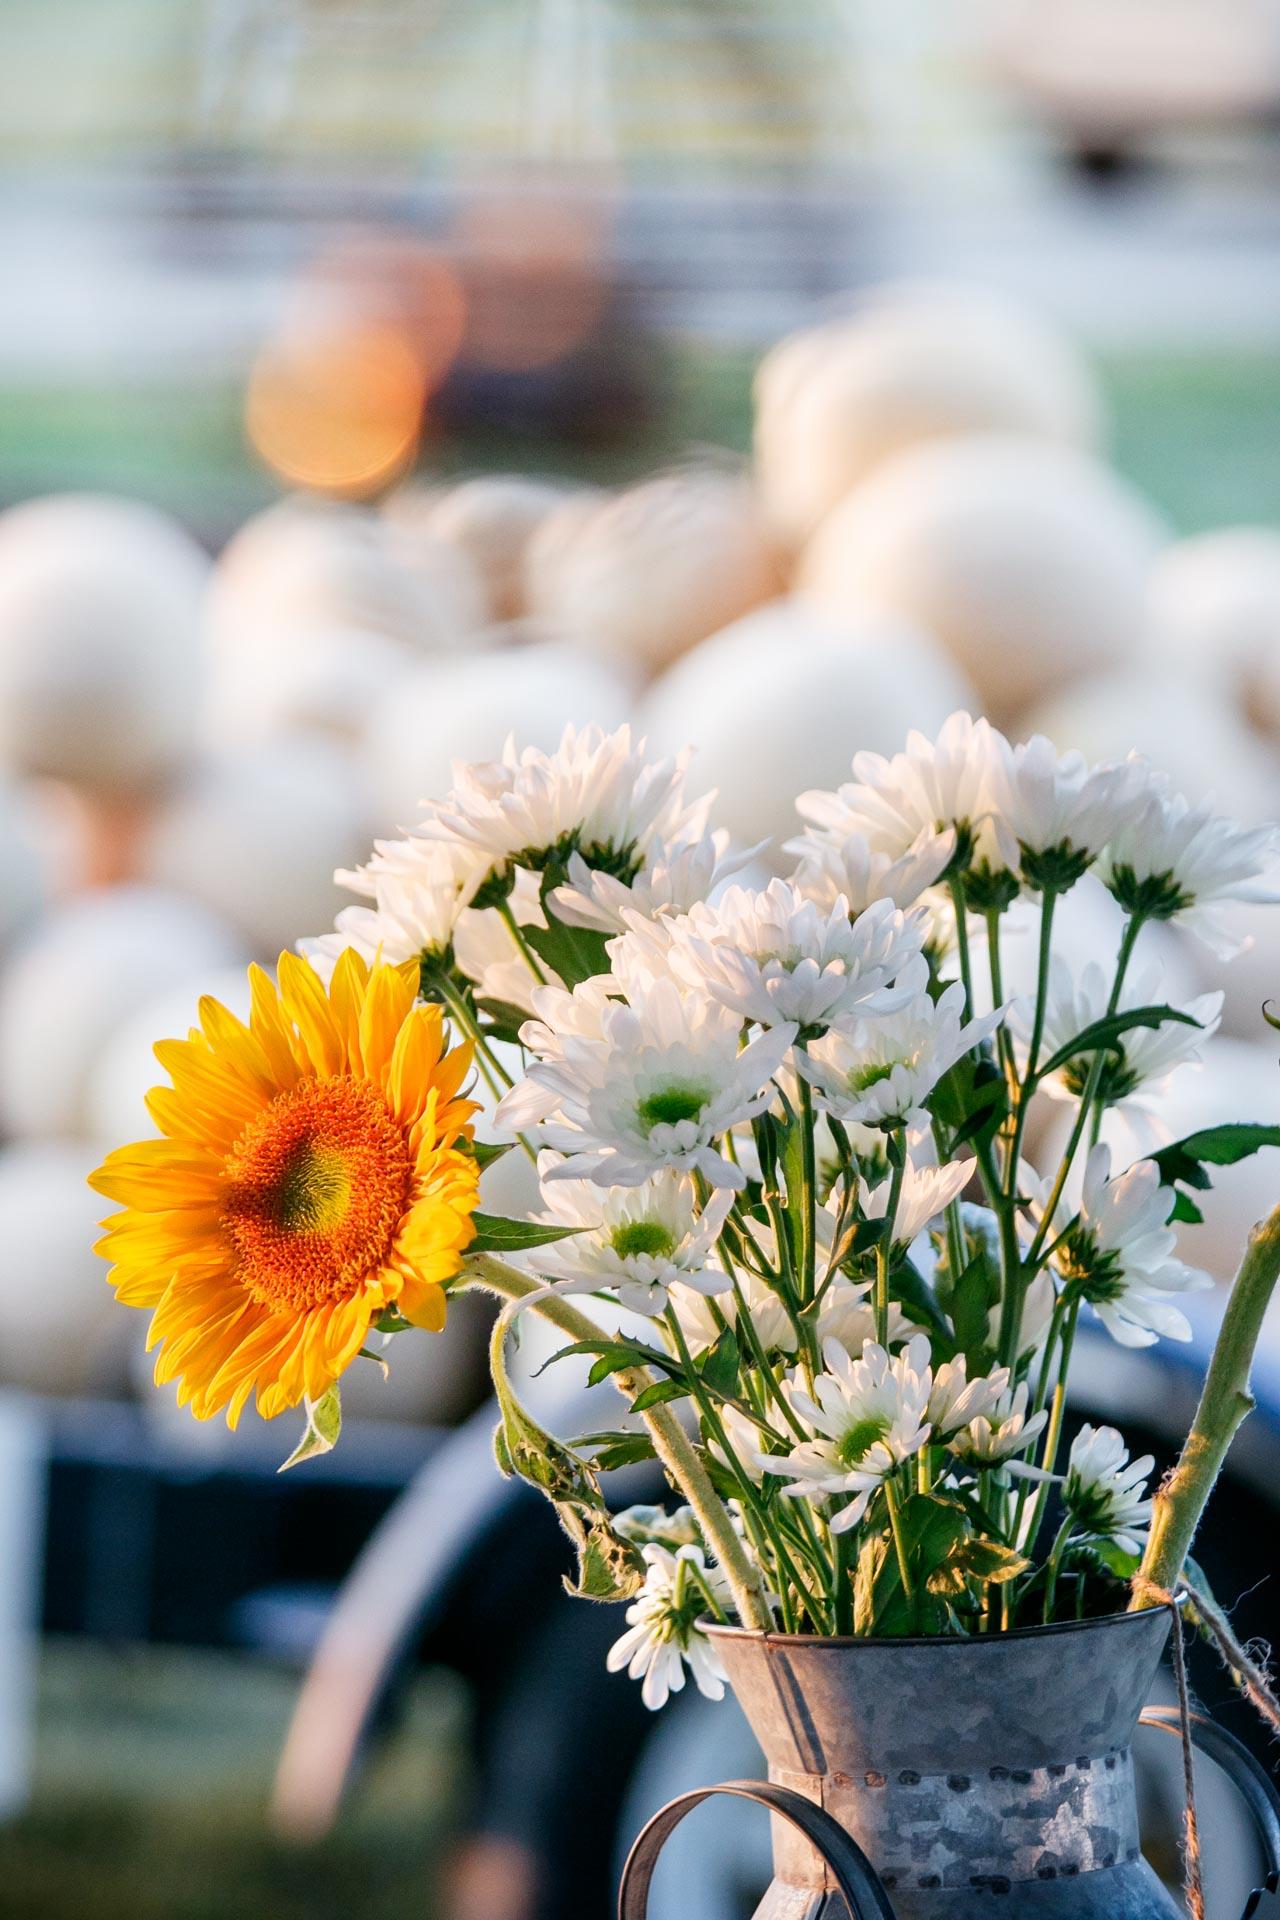 future-neenah-sunset-dinner-farm-to-table-adam-shea-photography-green-bay-appleton-neenah-photographer-27.jpg